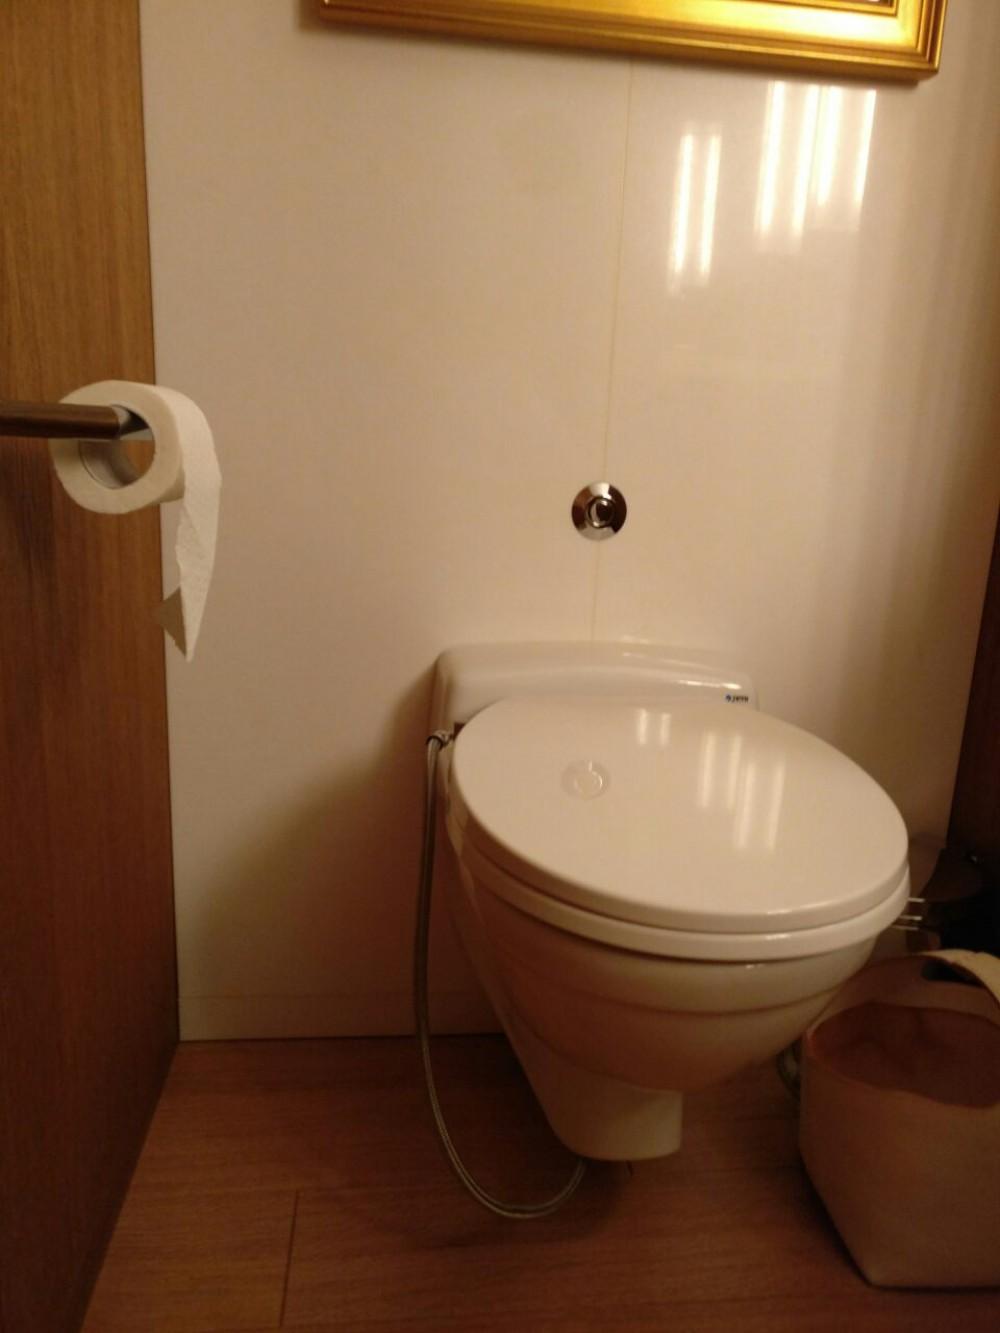 maro fp108 shower toilet bidet seat washlet